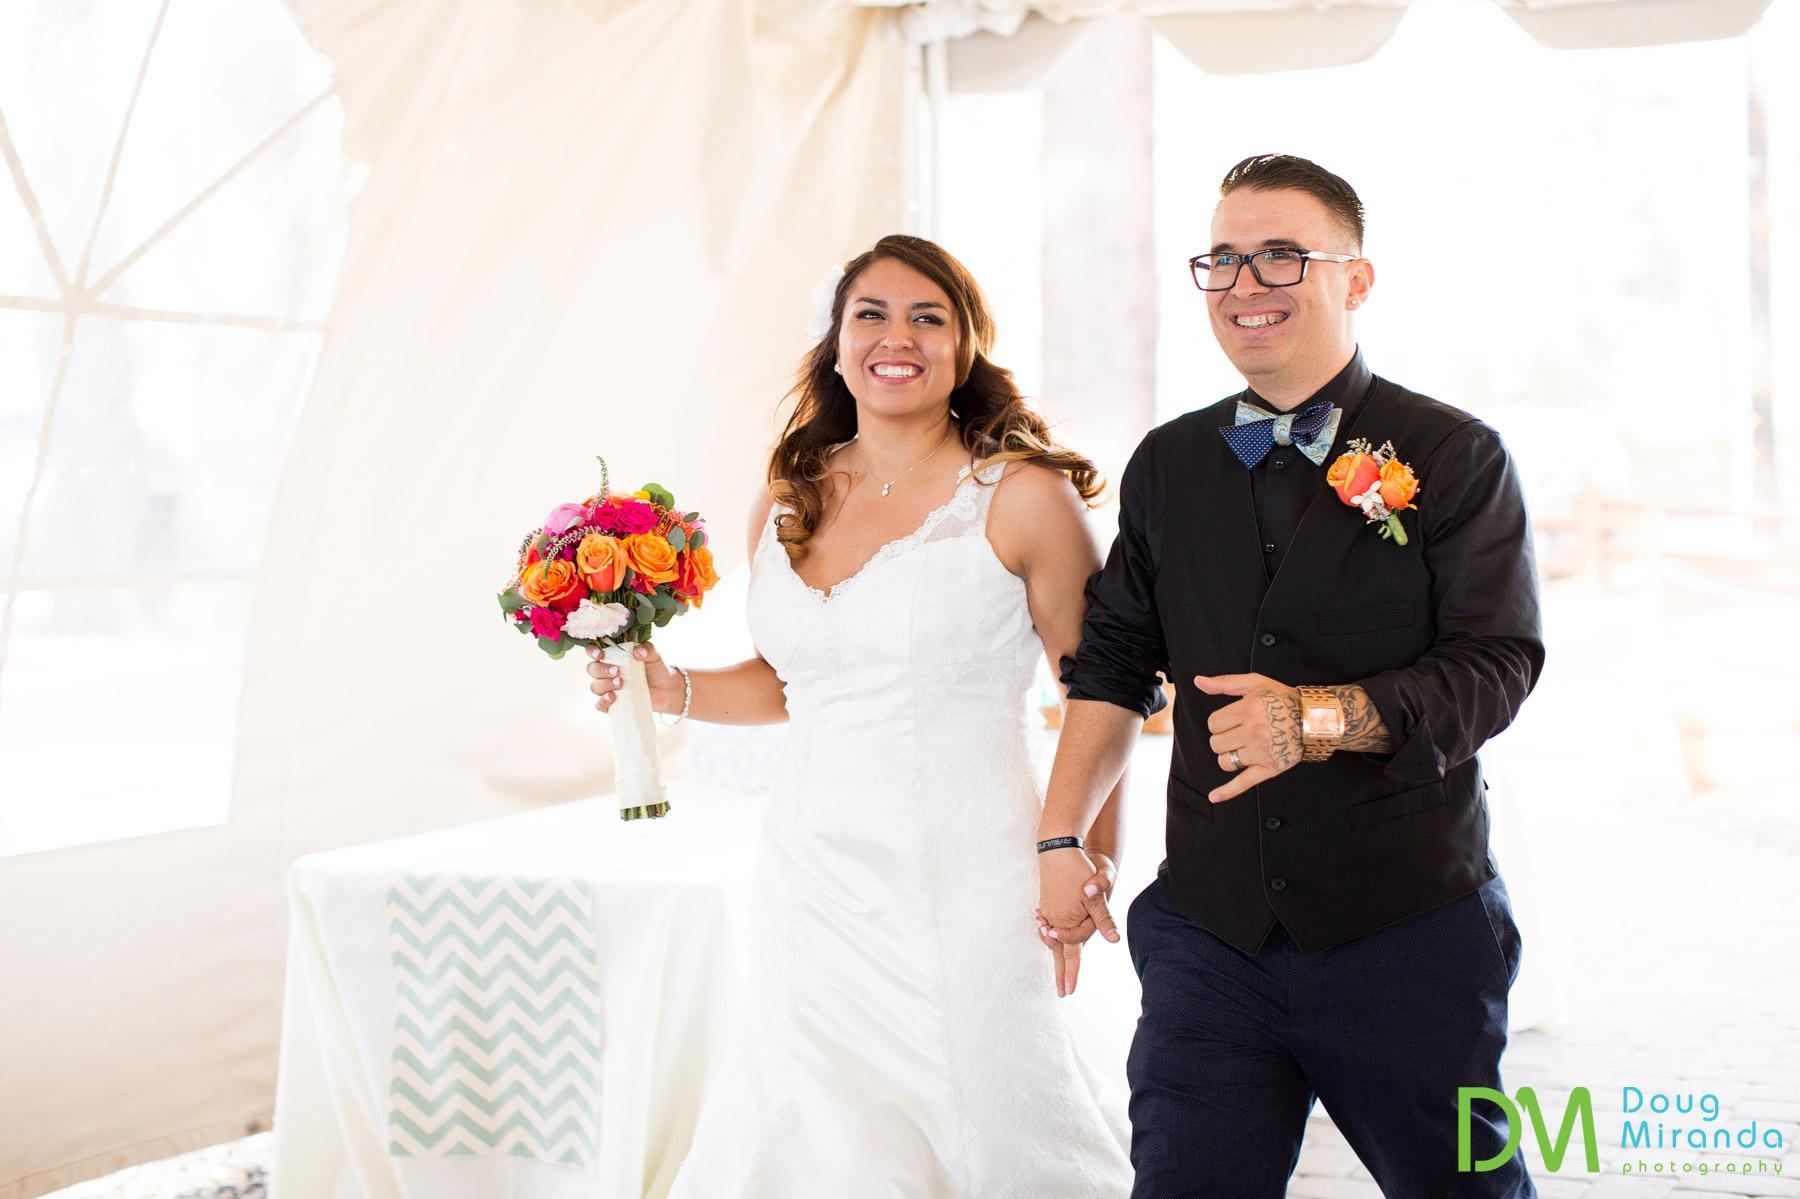 zephyr cove resort wedding reception